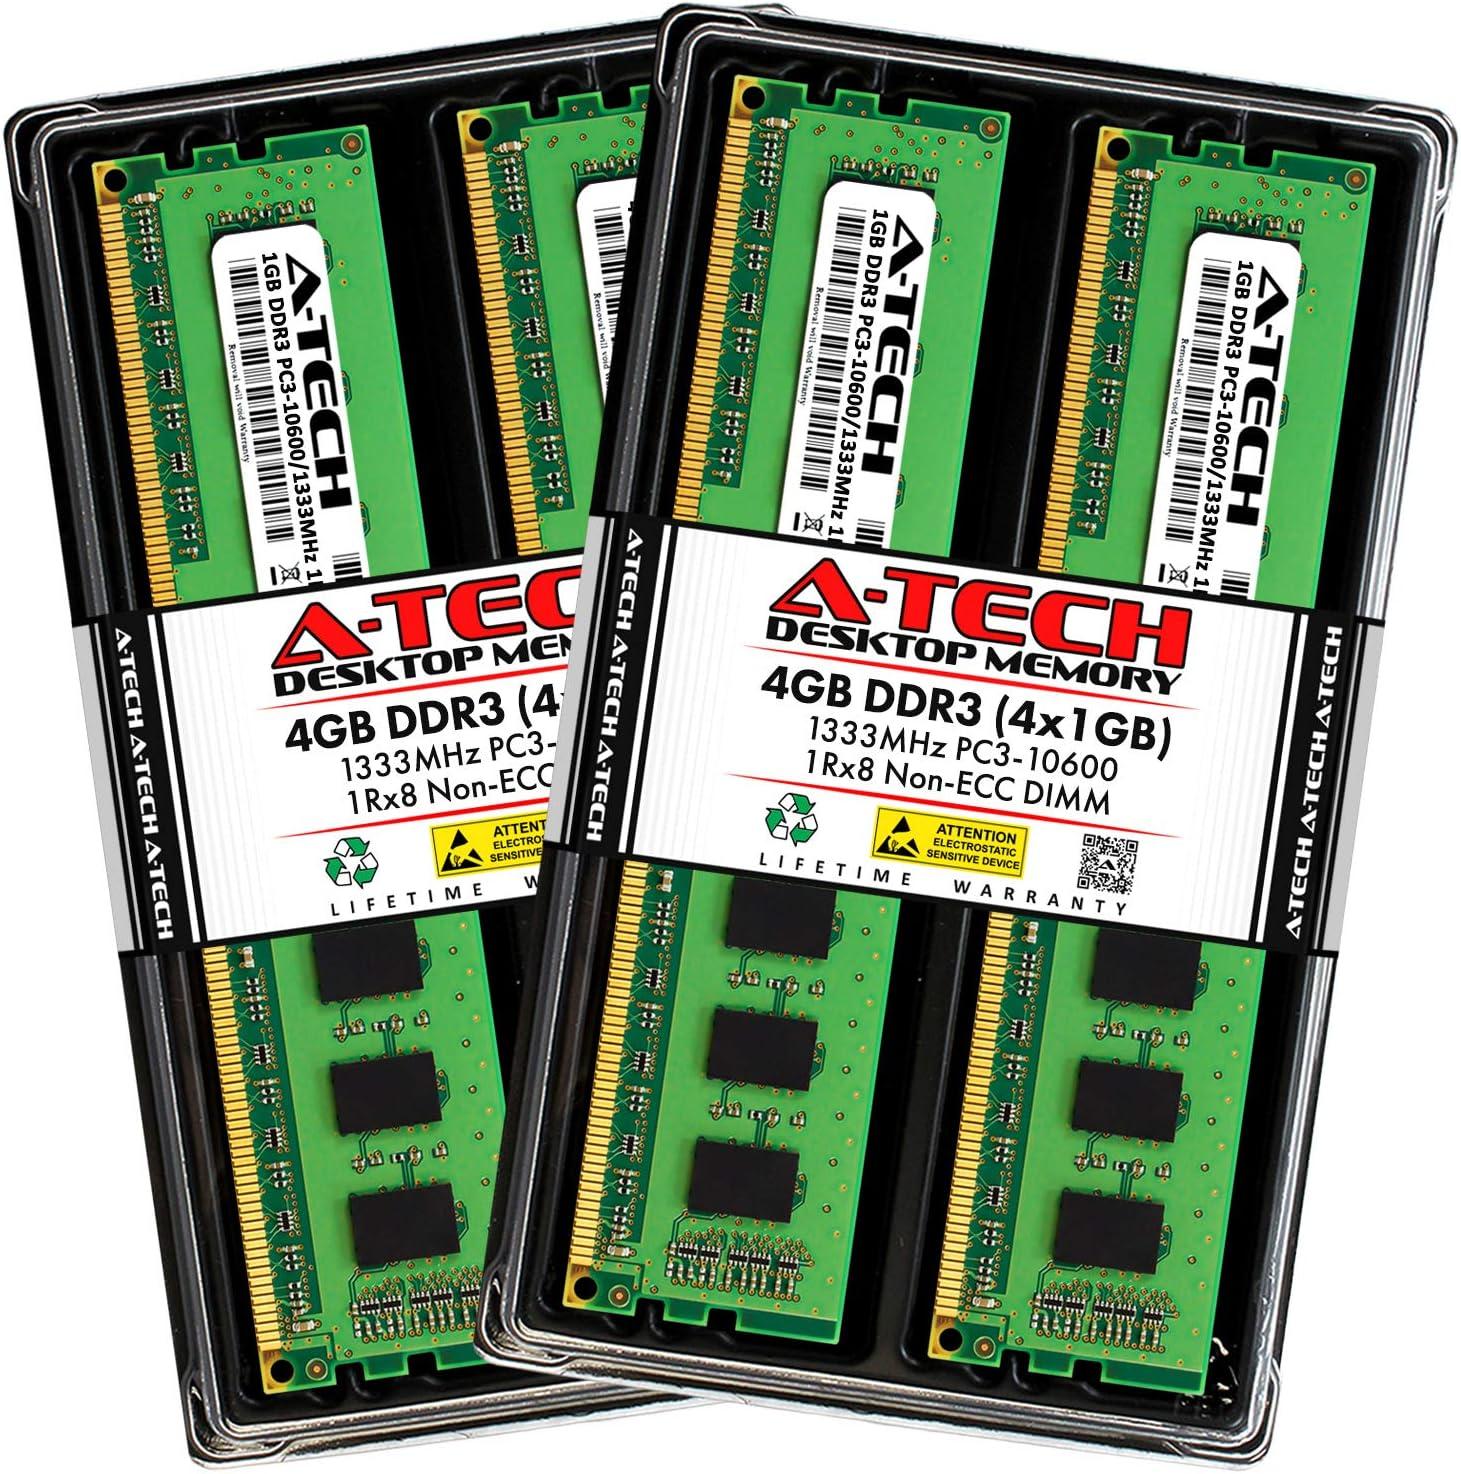 A-Tech 4GB DDR3 New mail order 1333MHz Desktop Memory PC3-10600 4 Ranking TOP5 N x Kit 1GB